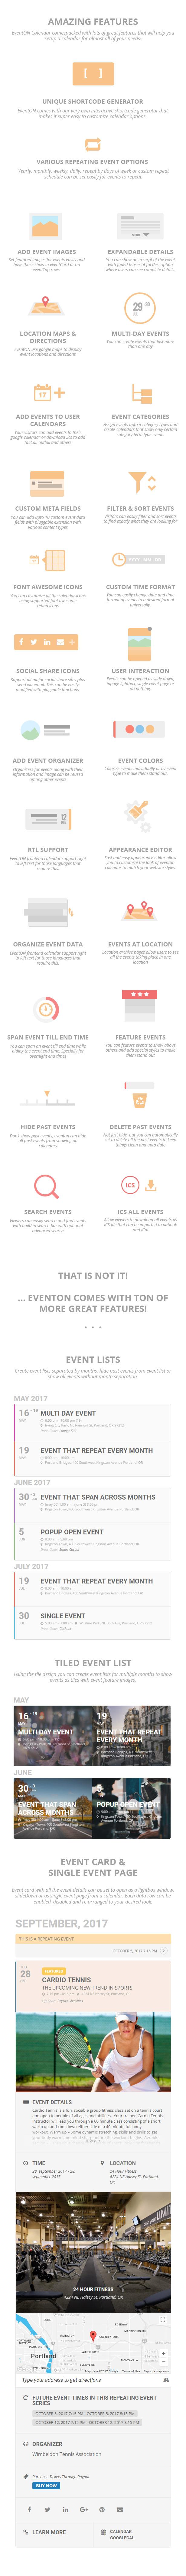 eventon wordpress event calendar plugin by ashanjay codecanyon